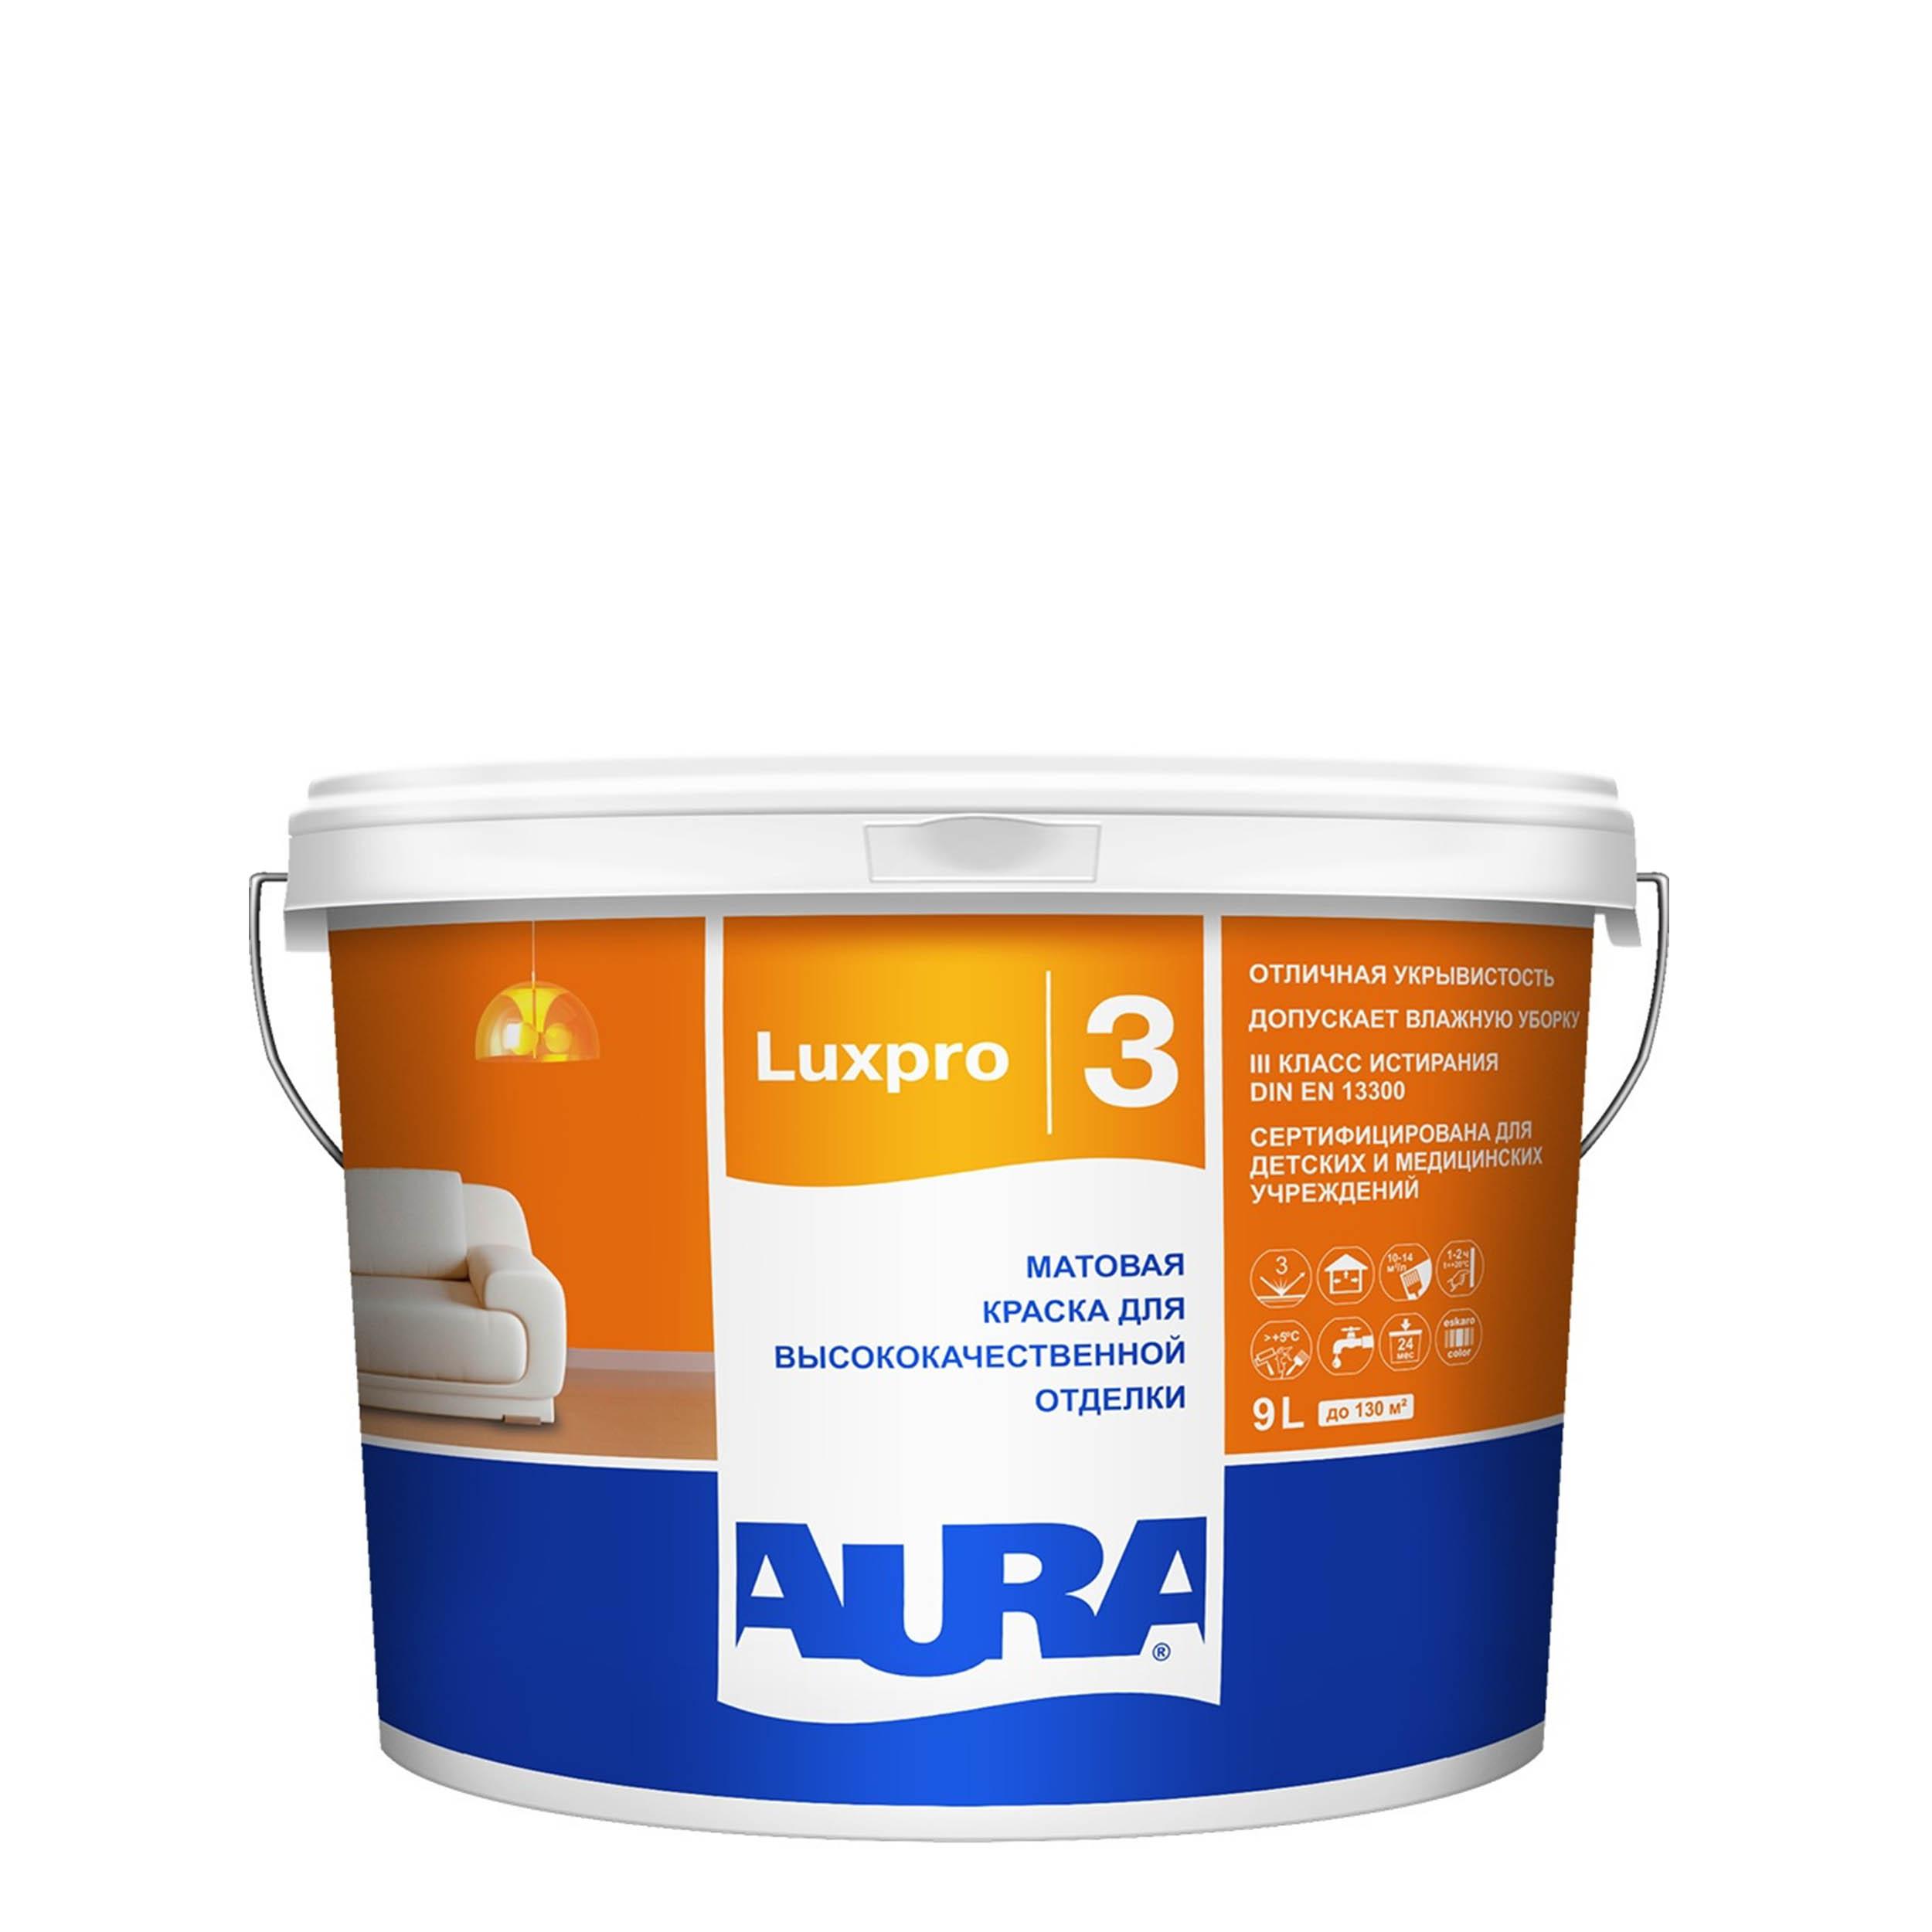 Фото 3 - Краска интерьерная, Aura LuxPRO 3, RAL 7043, 11 кг.